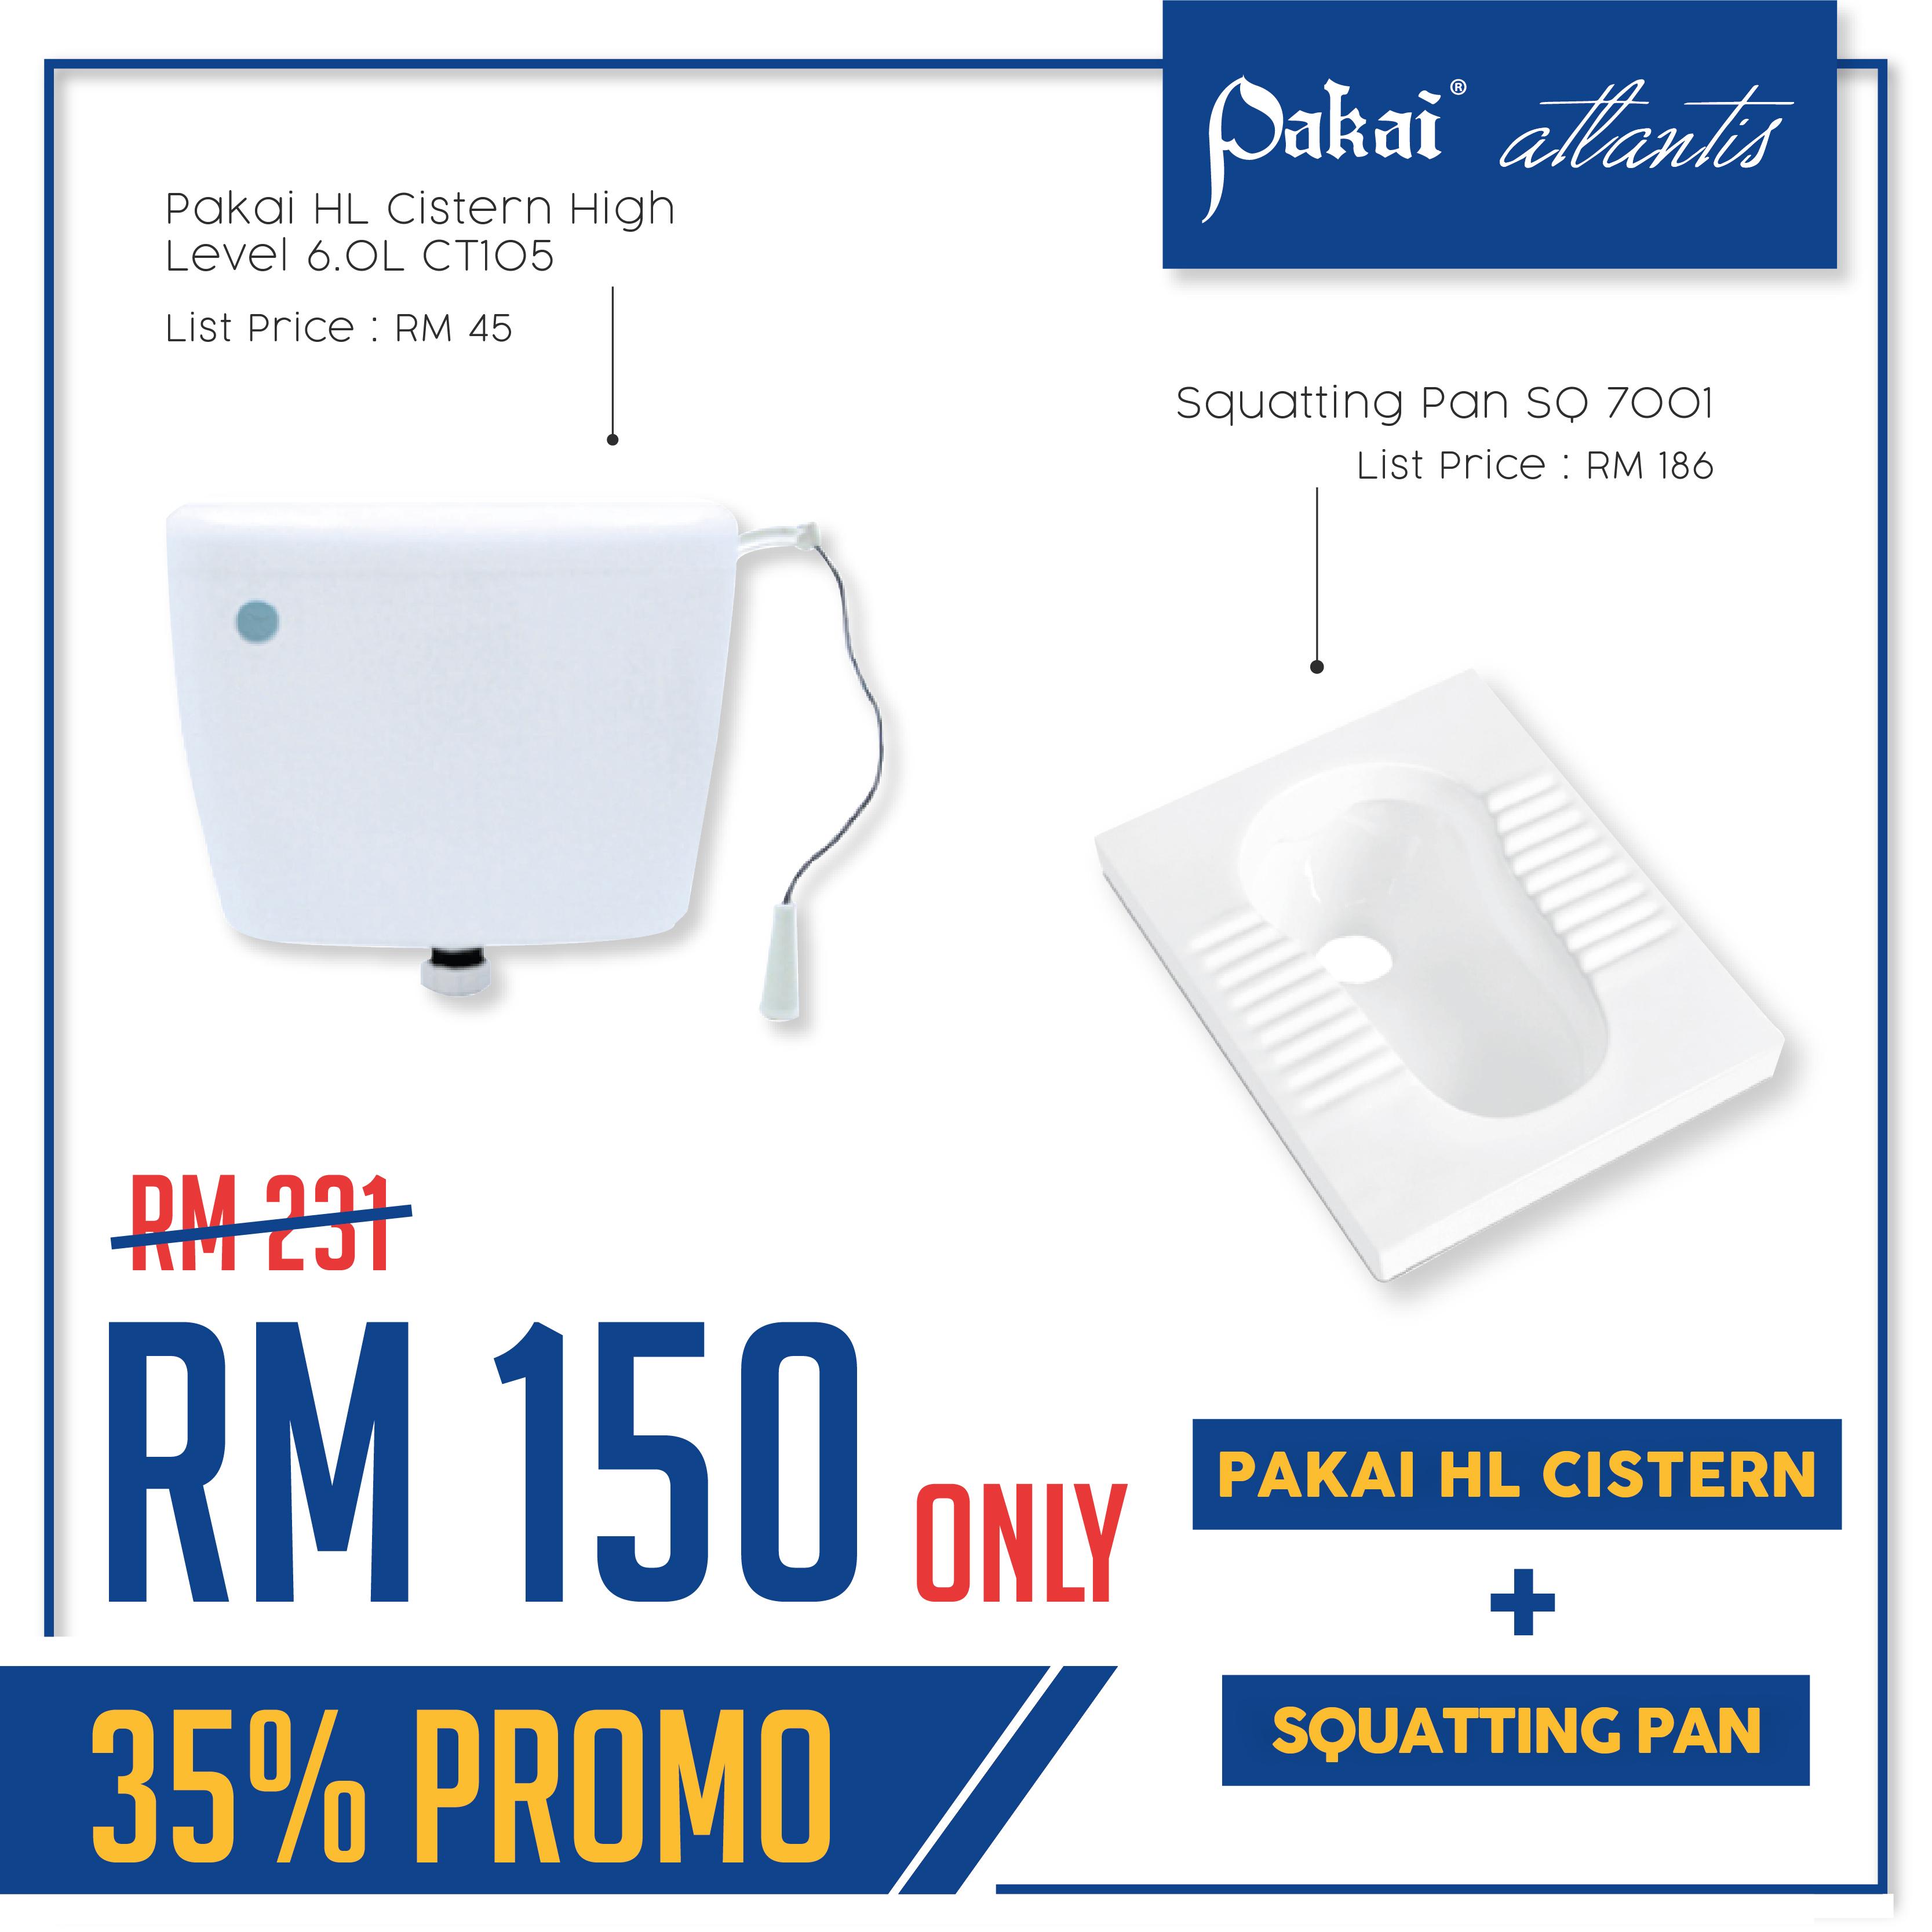 COMBO PROMOTION : Pakai HL Cistern High Level CT105 + Squatting Pan SQ7001 [35% PROMO]